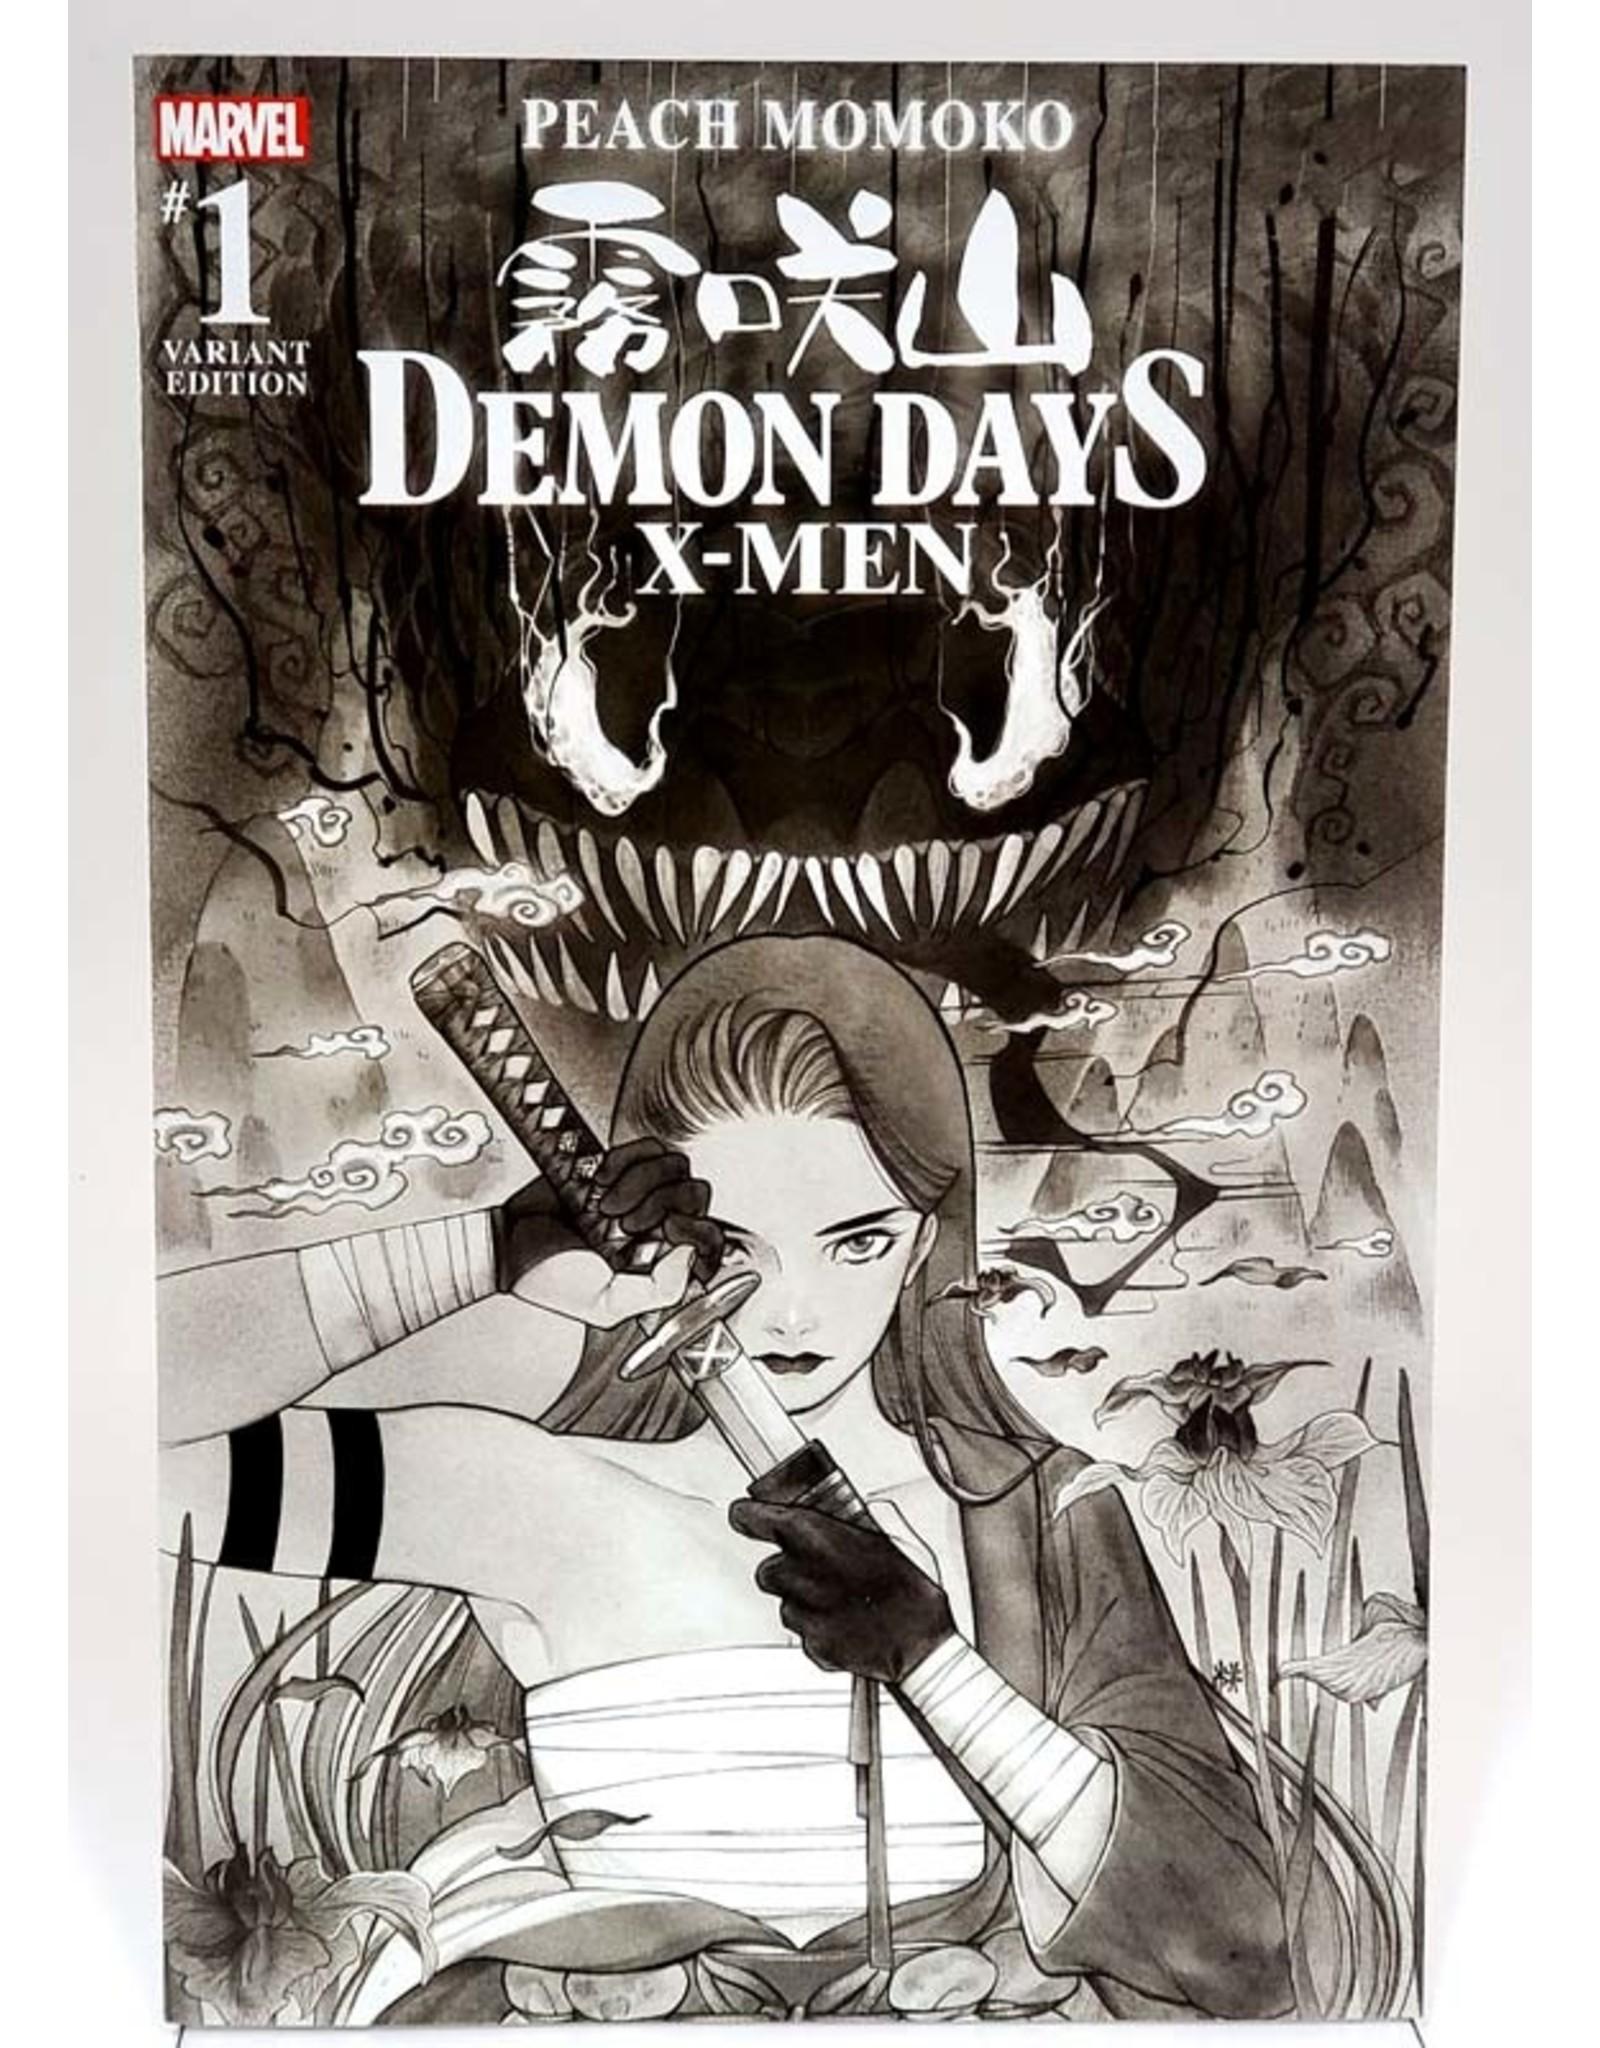 MARVEL COMICS DEMON DAYS X-MEN #1 COMICSPRO EXCL VAR